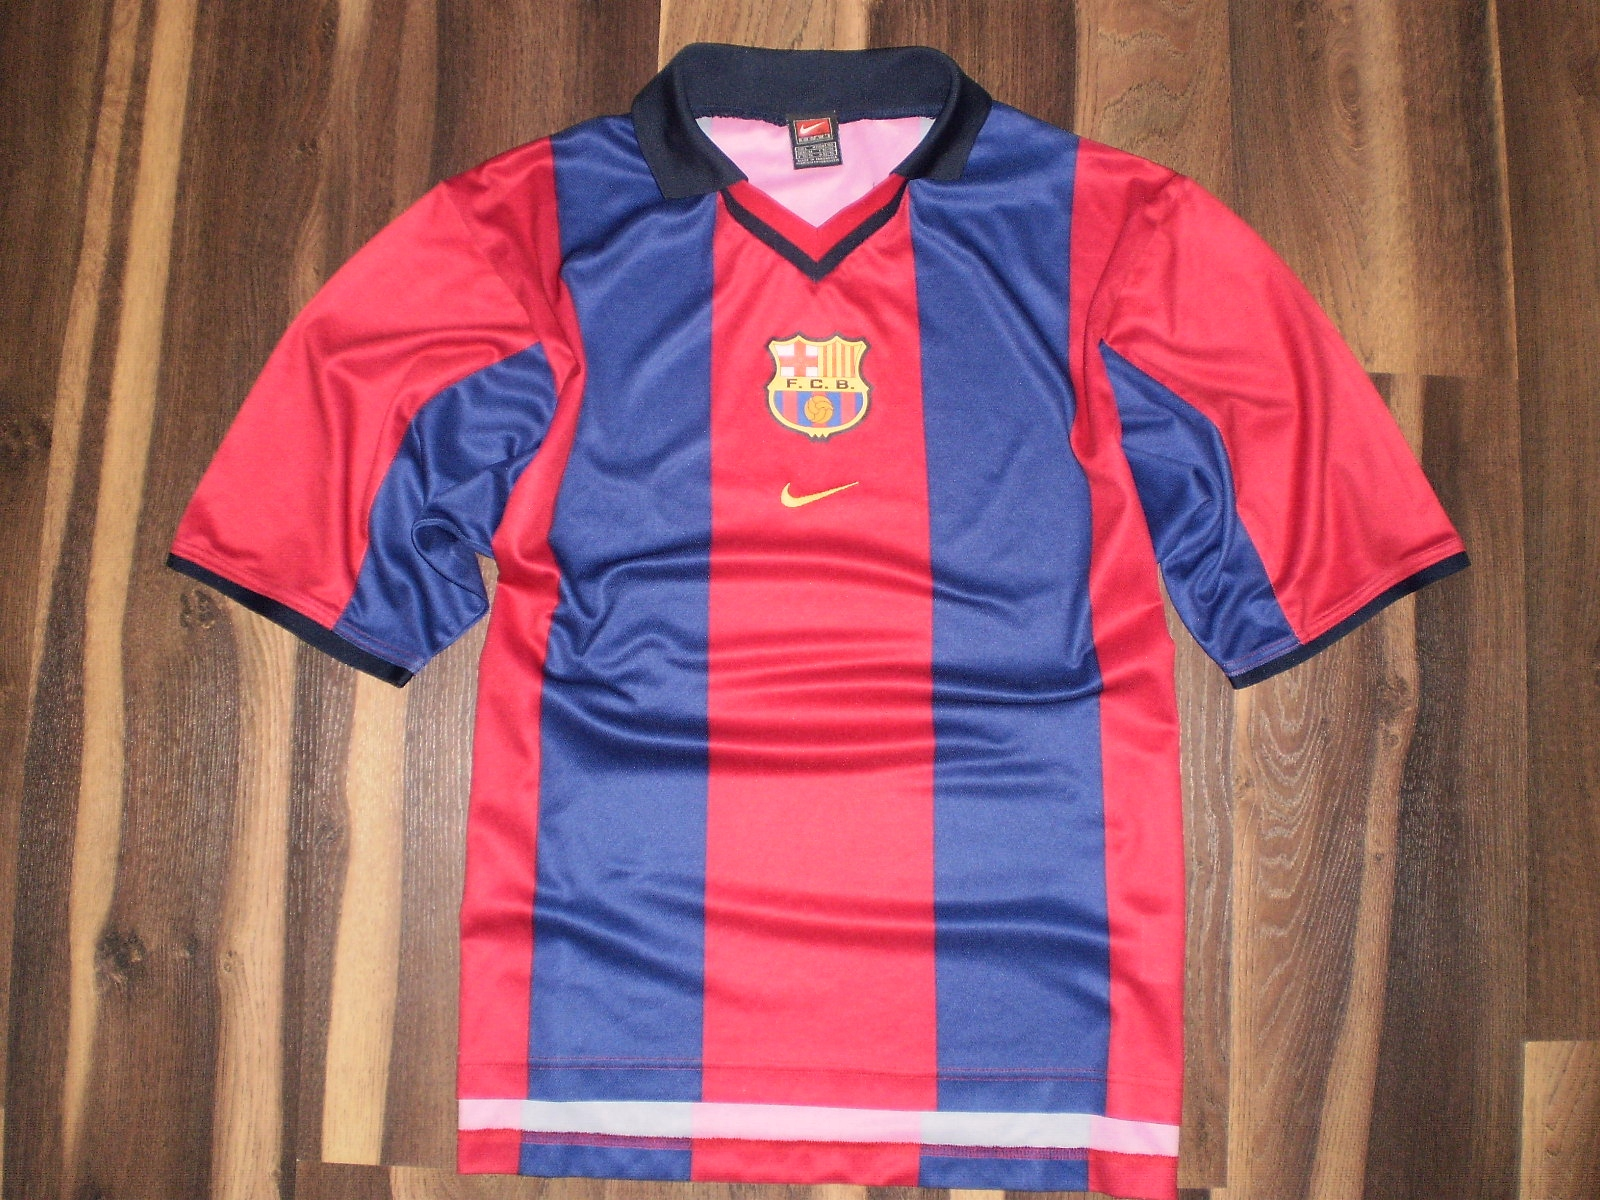 0bba0daca FC BARCELONA ___ Nike *** L - oldschool FCB retro - 7703767292 ...